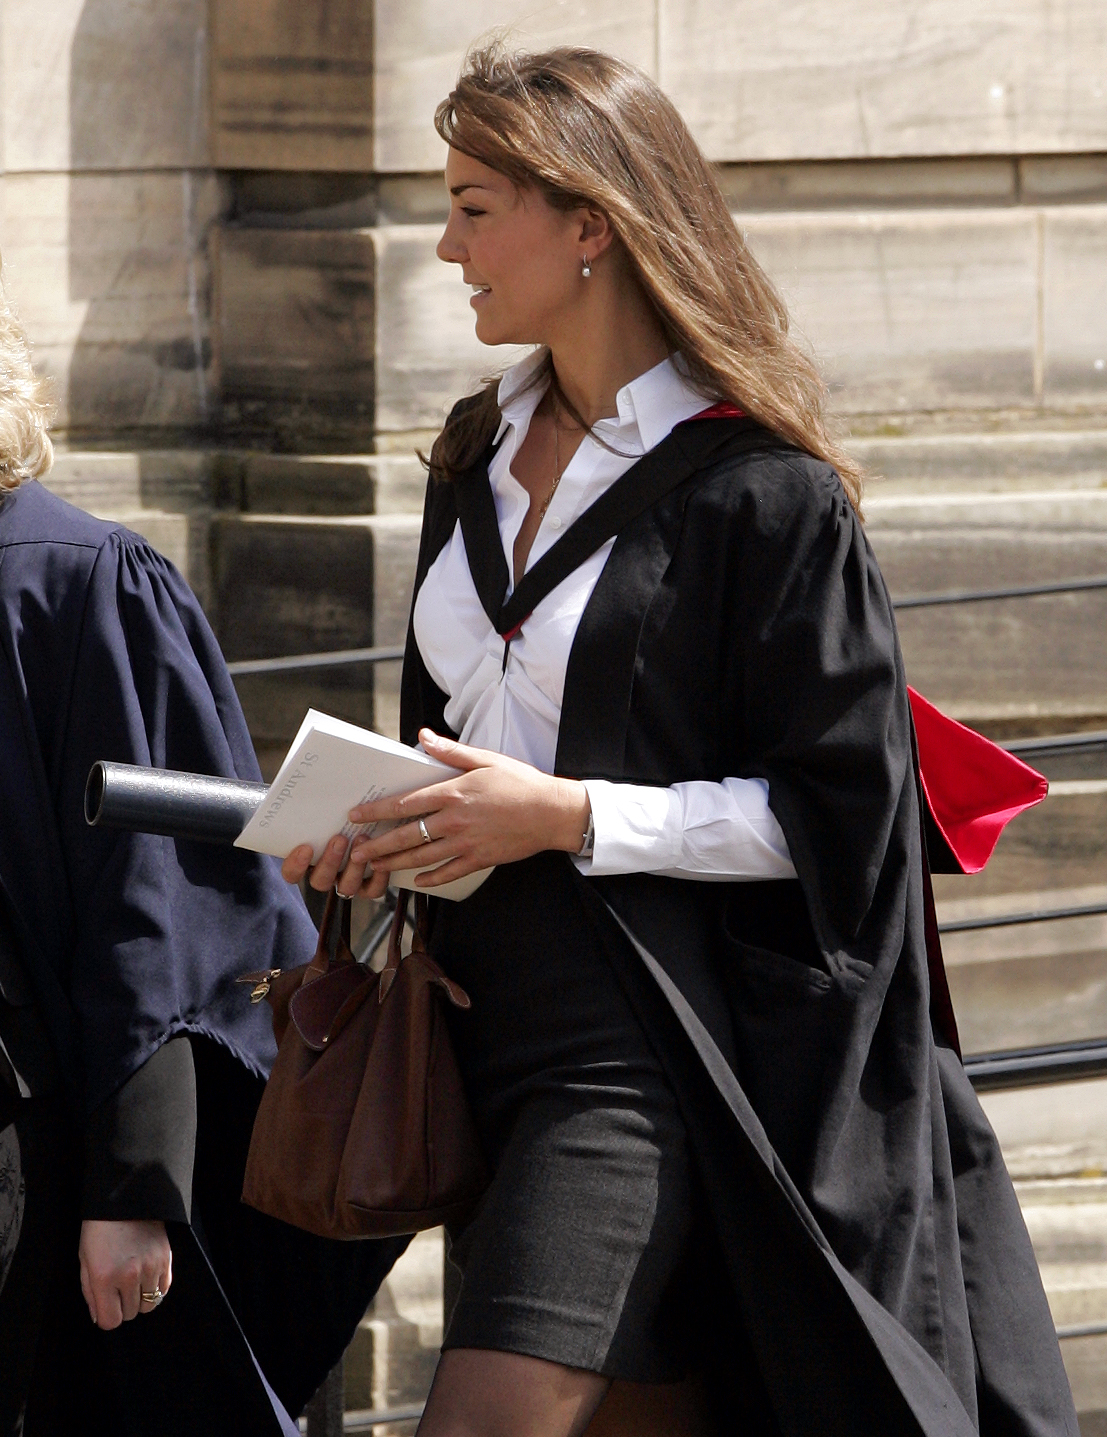 Catherine Duchess of Cambridge Photo C GETTY IMAGES 0477